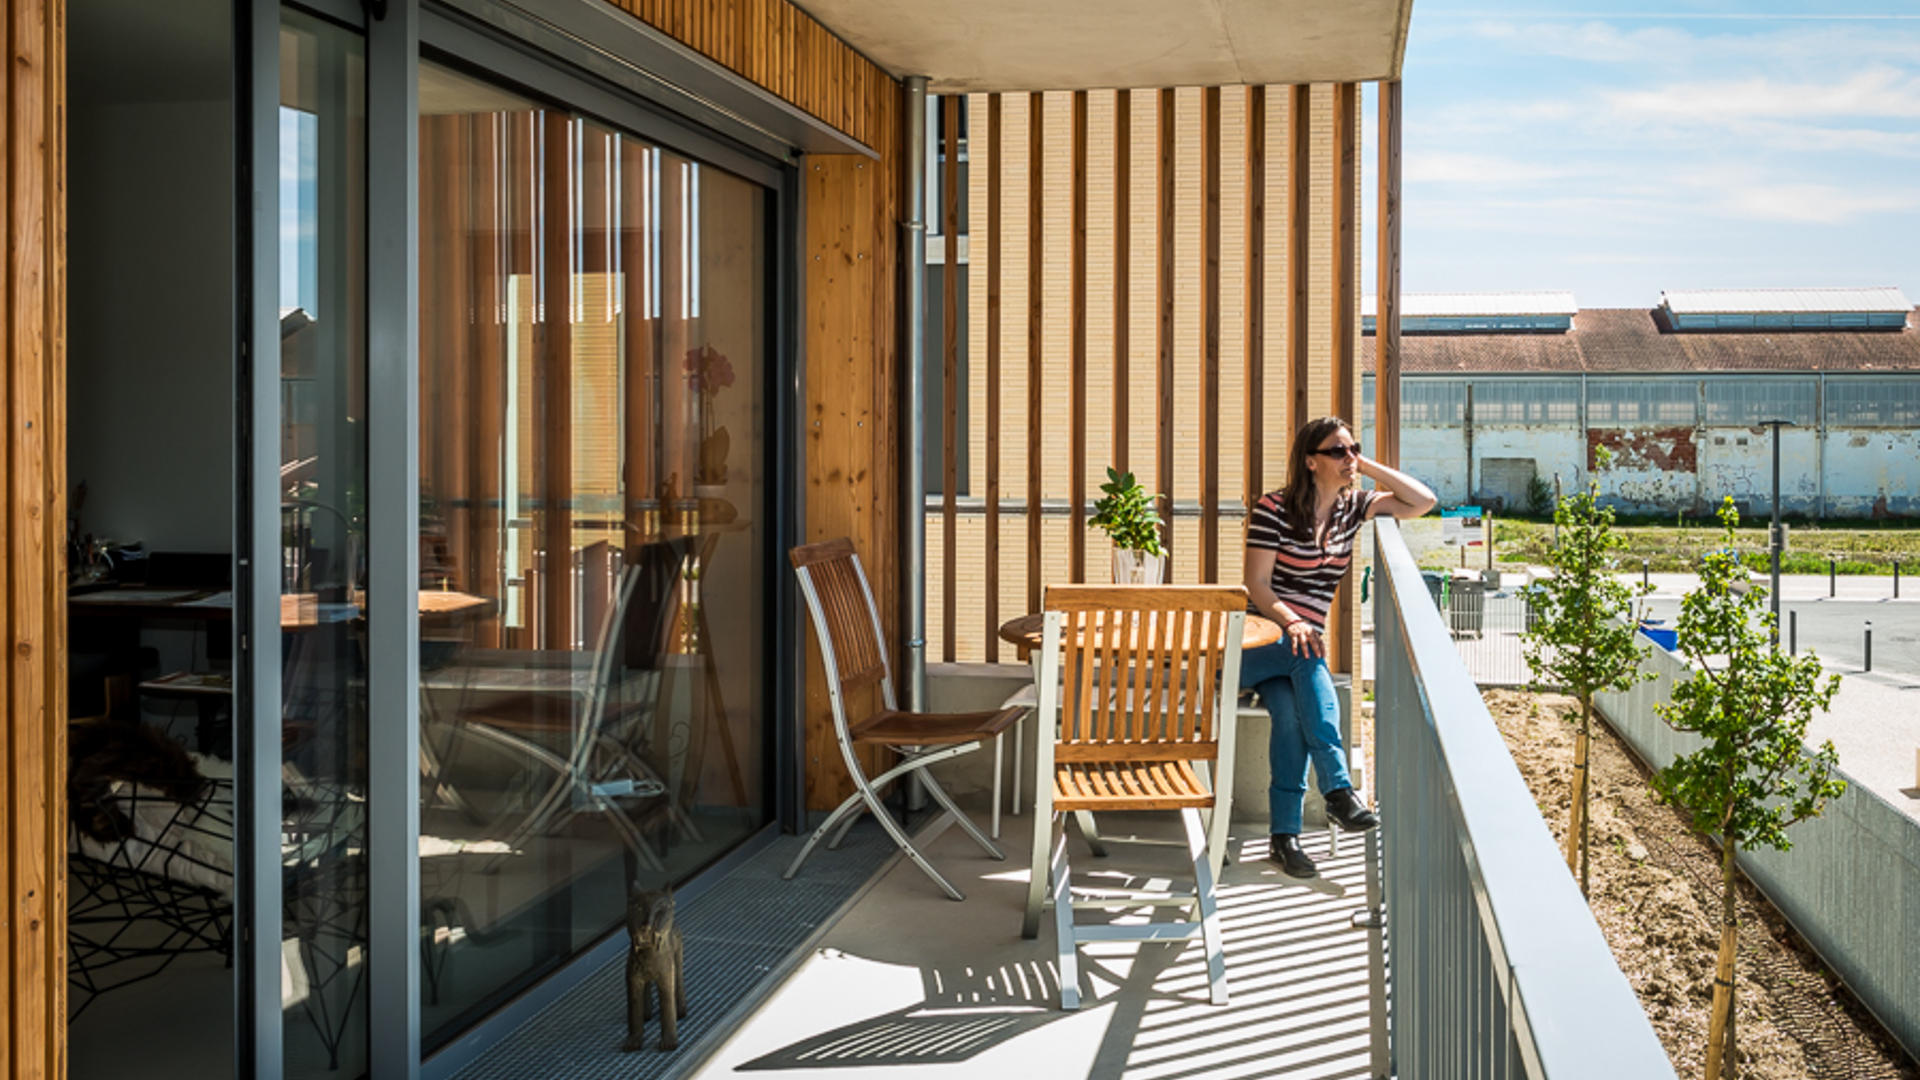 Seuil-architecture-Abricoop-terrasse-sud-Leslie-slid